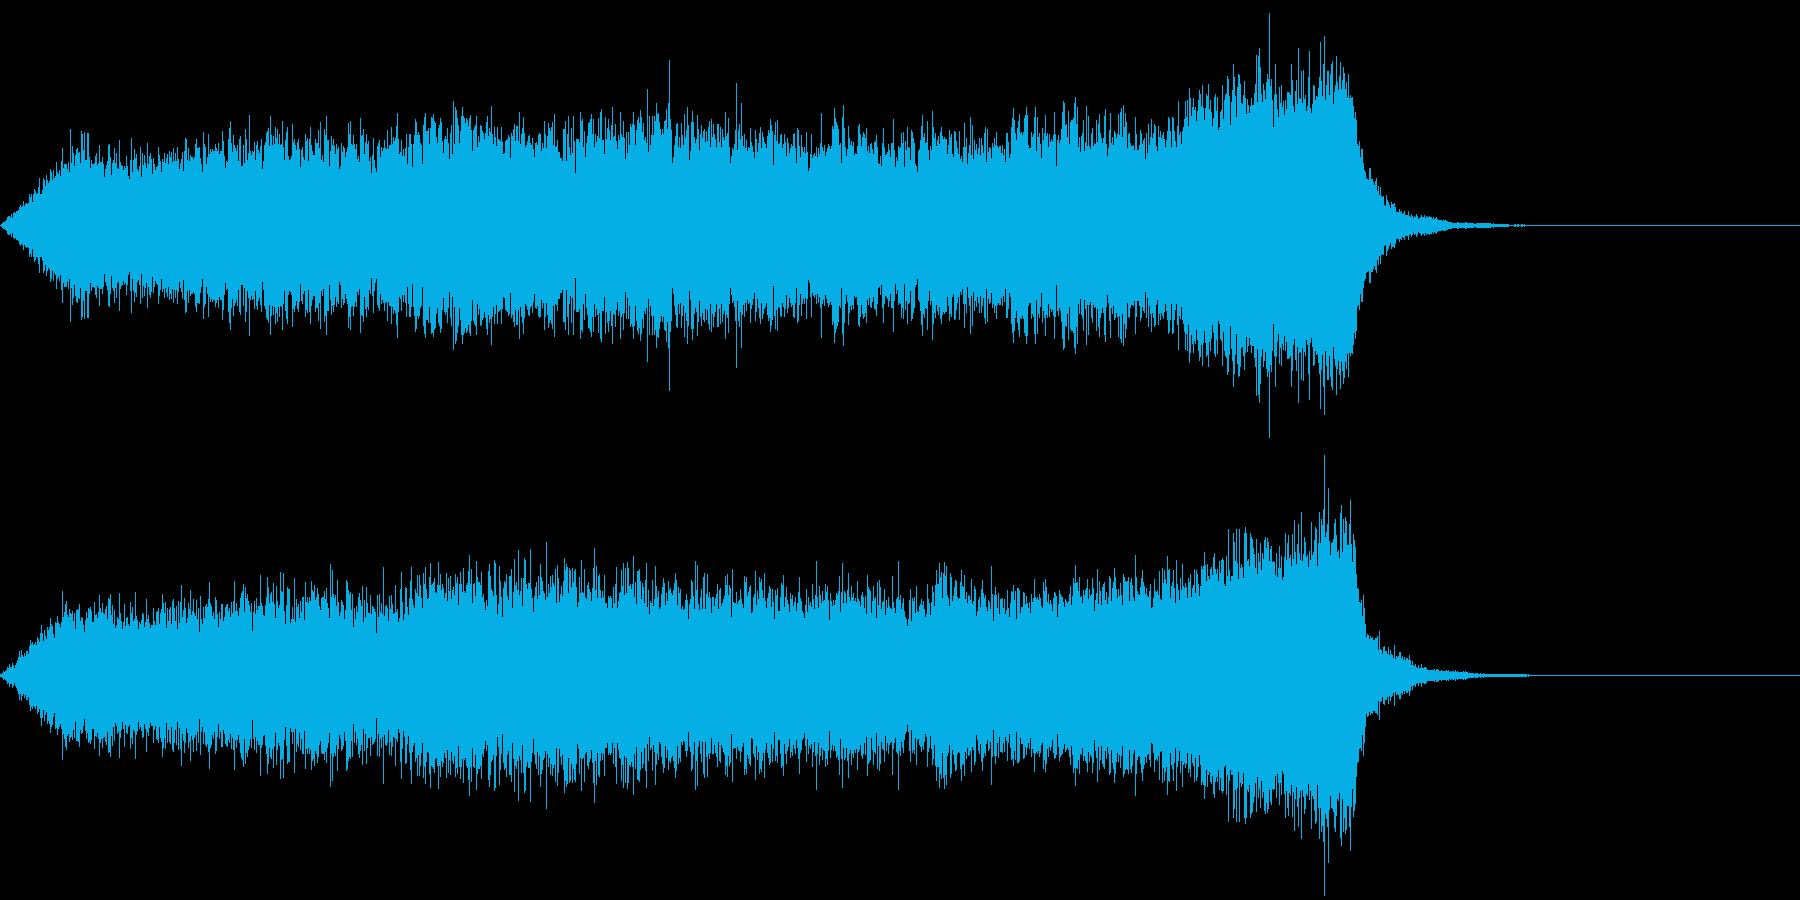 CINEMATIC RISER_03の再生済みの波形